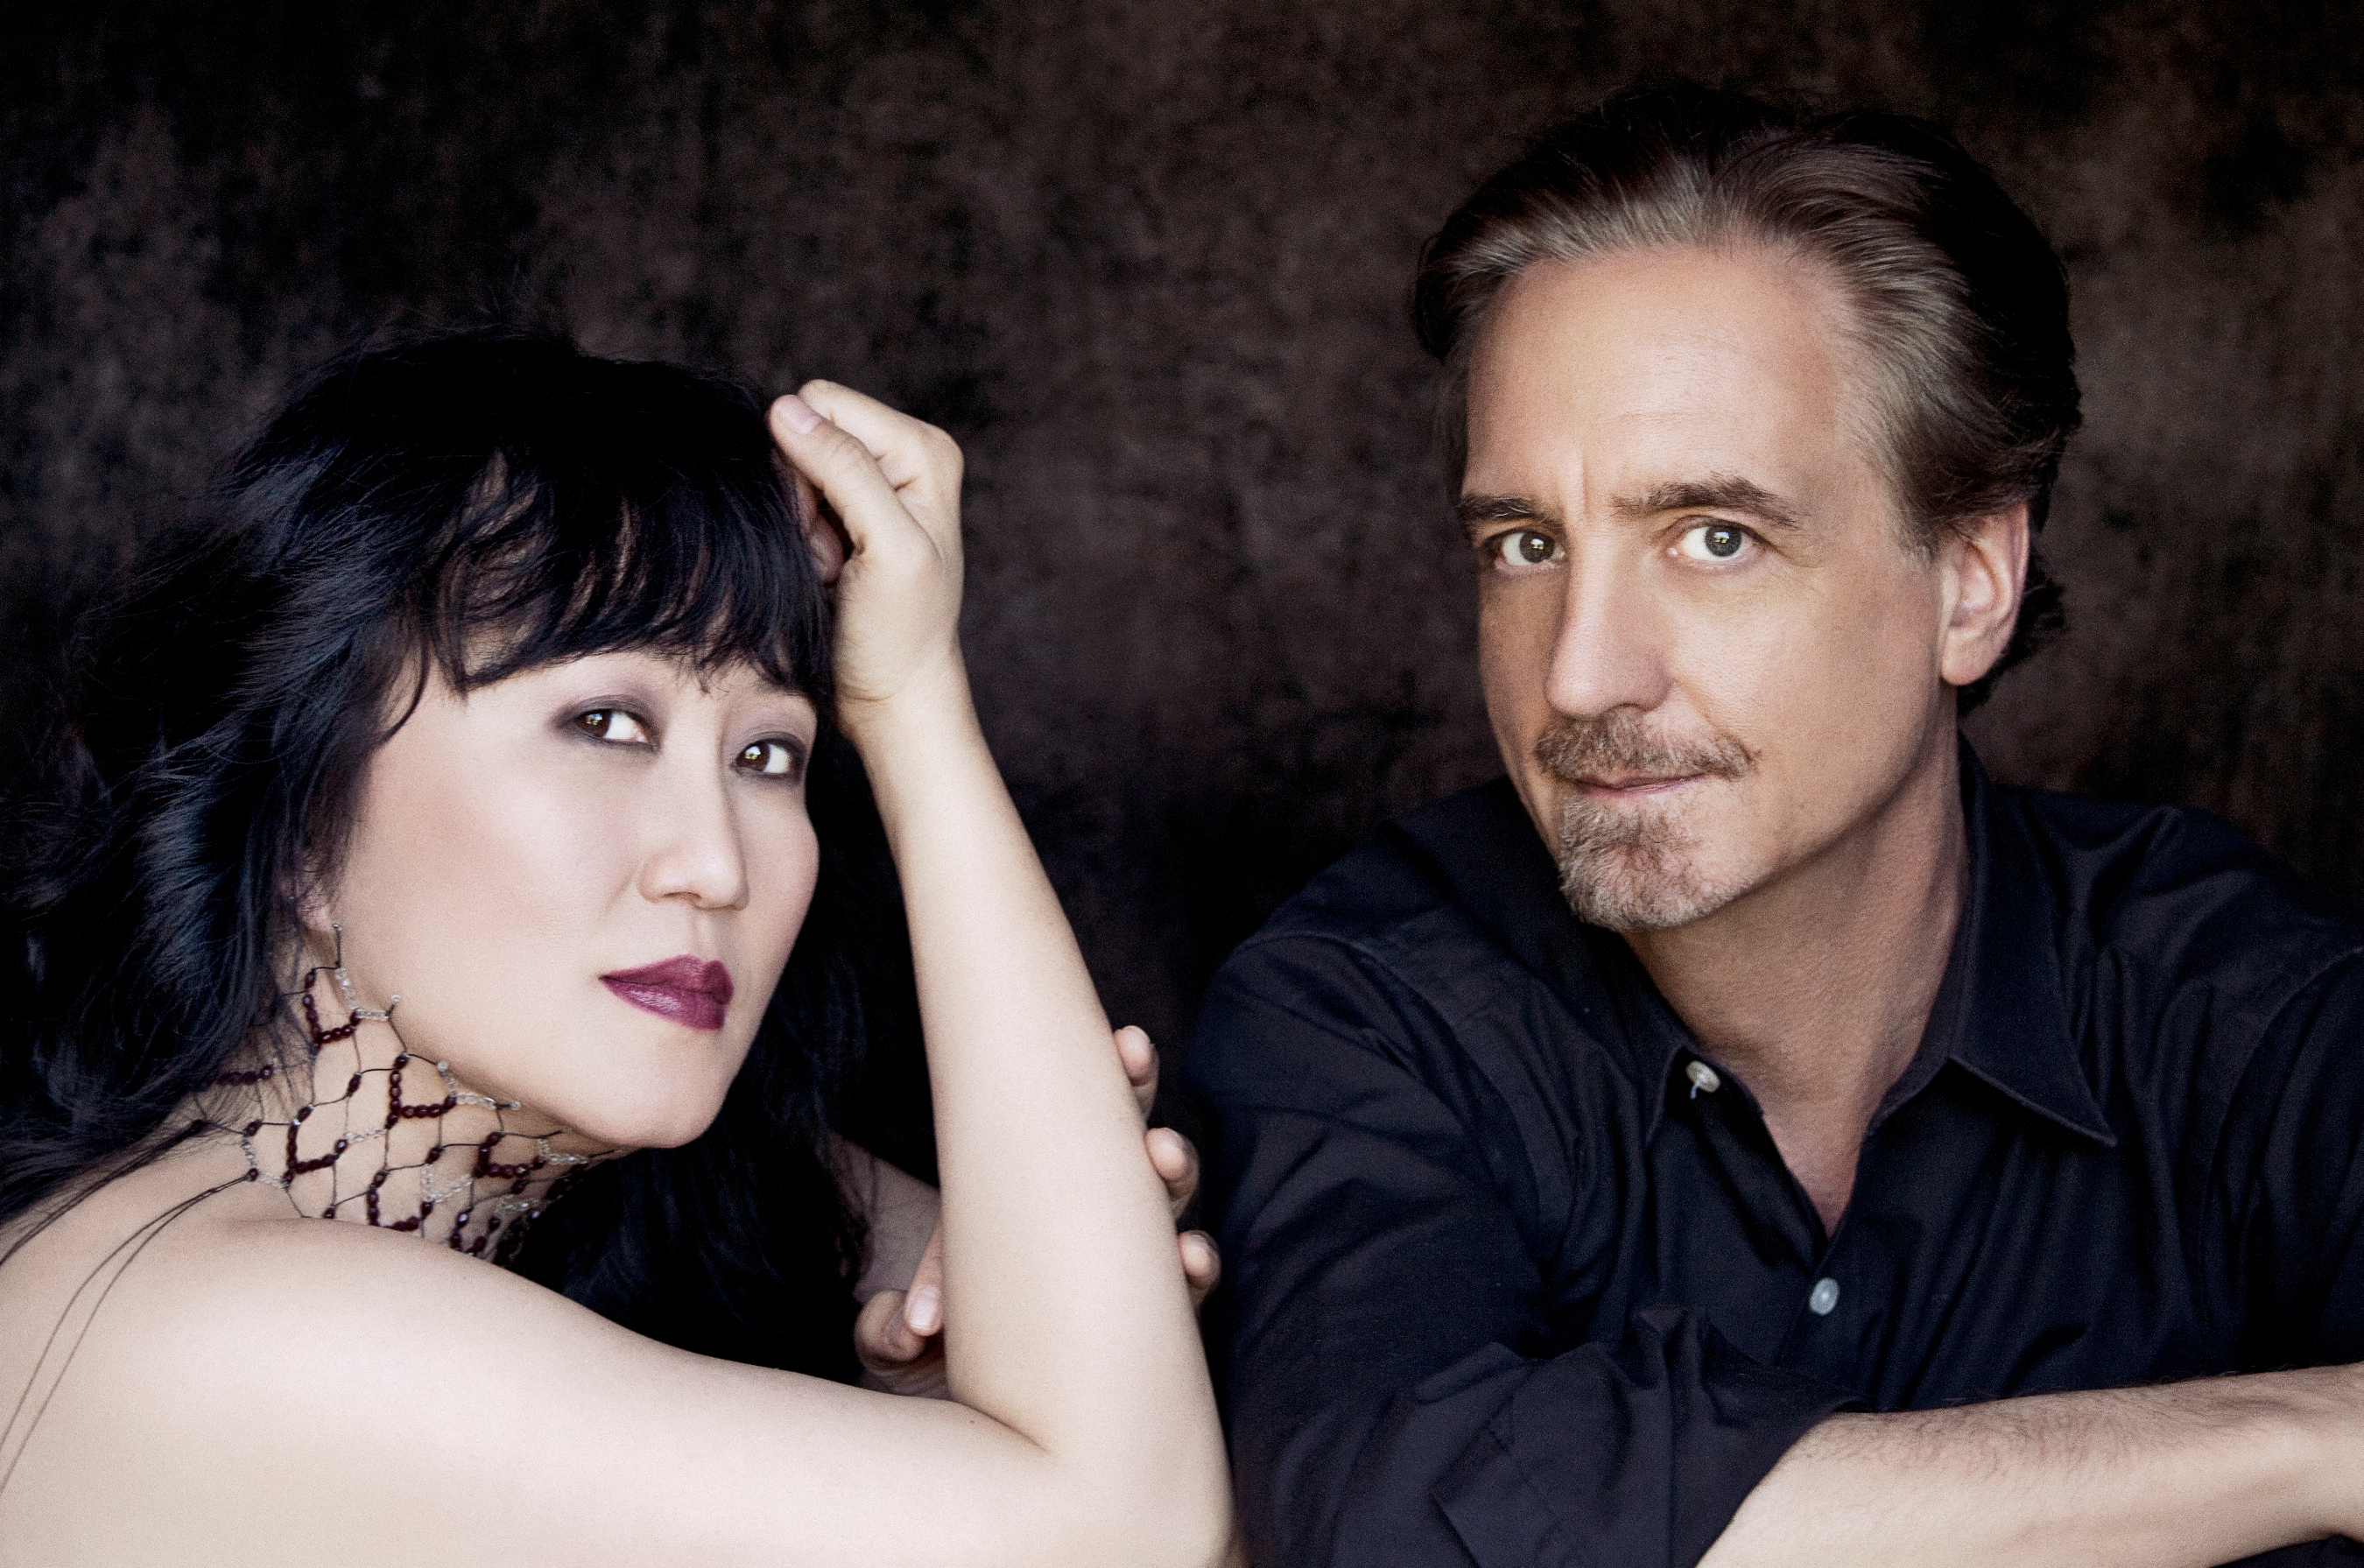 Wu Han and David Finckel by Lisa Marie Mazzucco